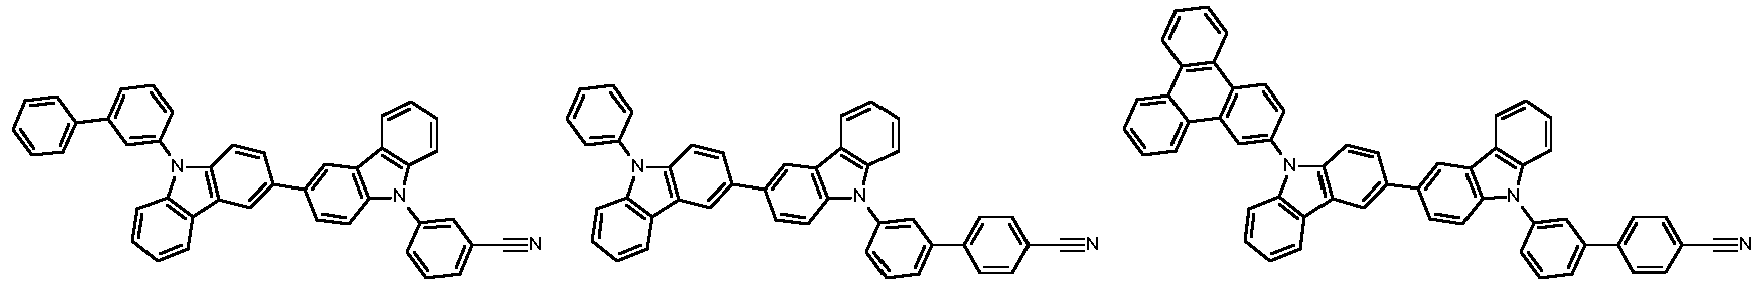 Figure imgb0839